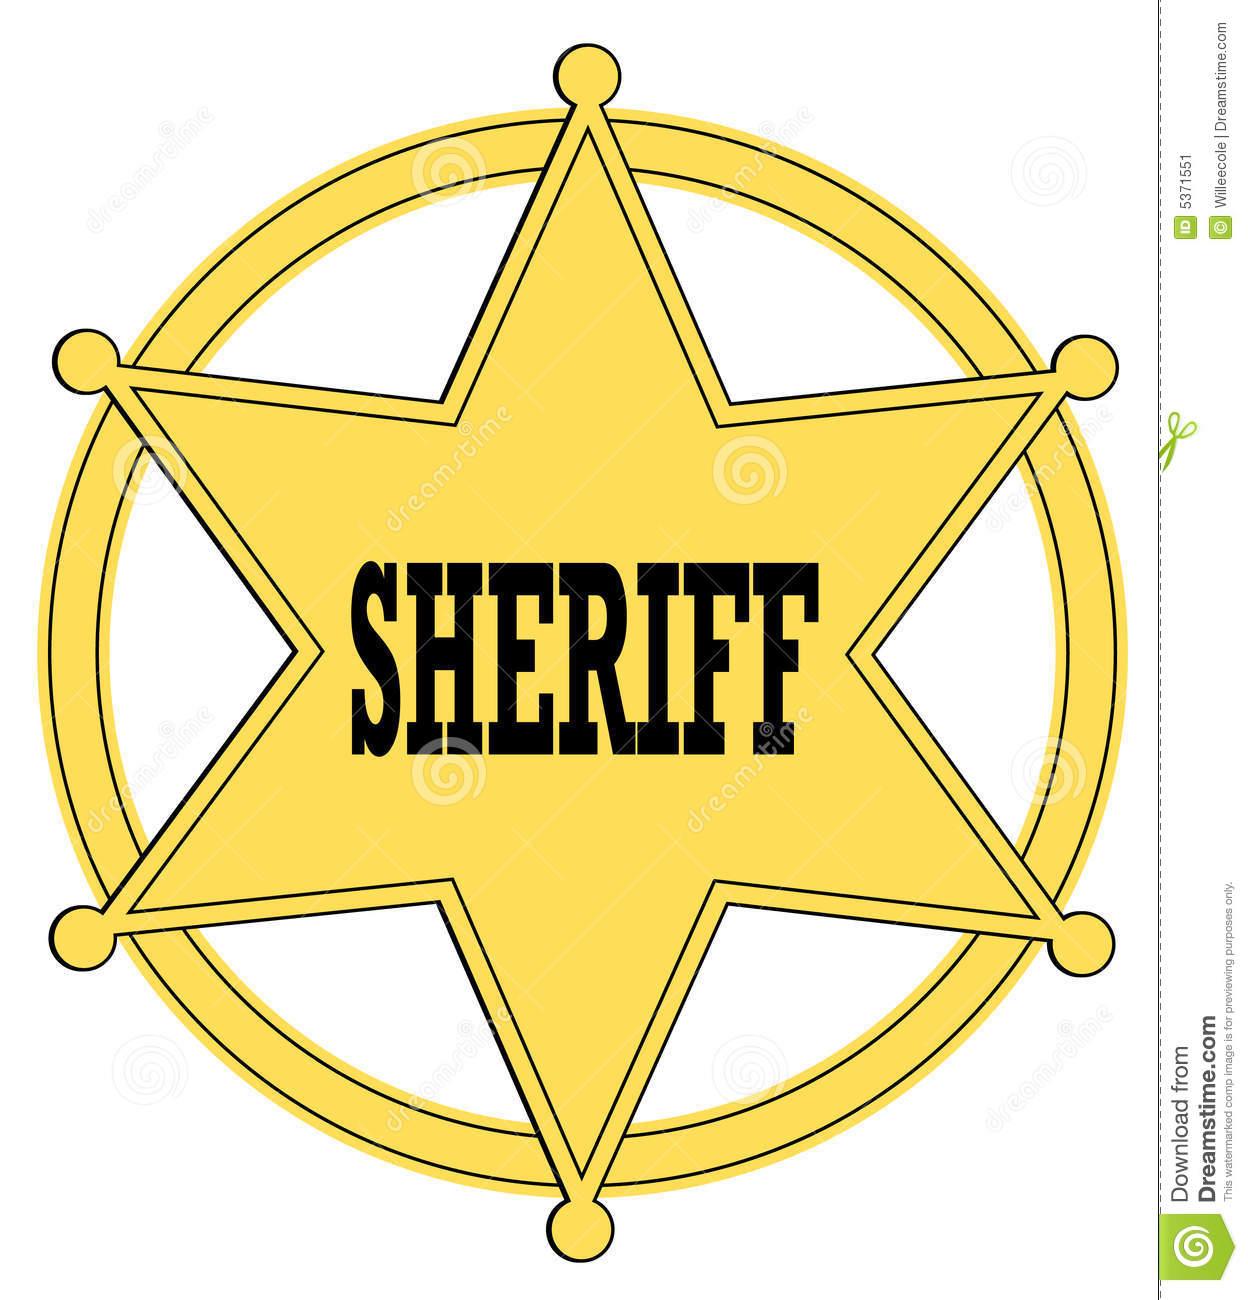 detective badge clip art clipart panda free clipart images sheriff's badge clip art sheriff badge clipart free